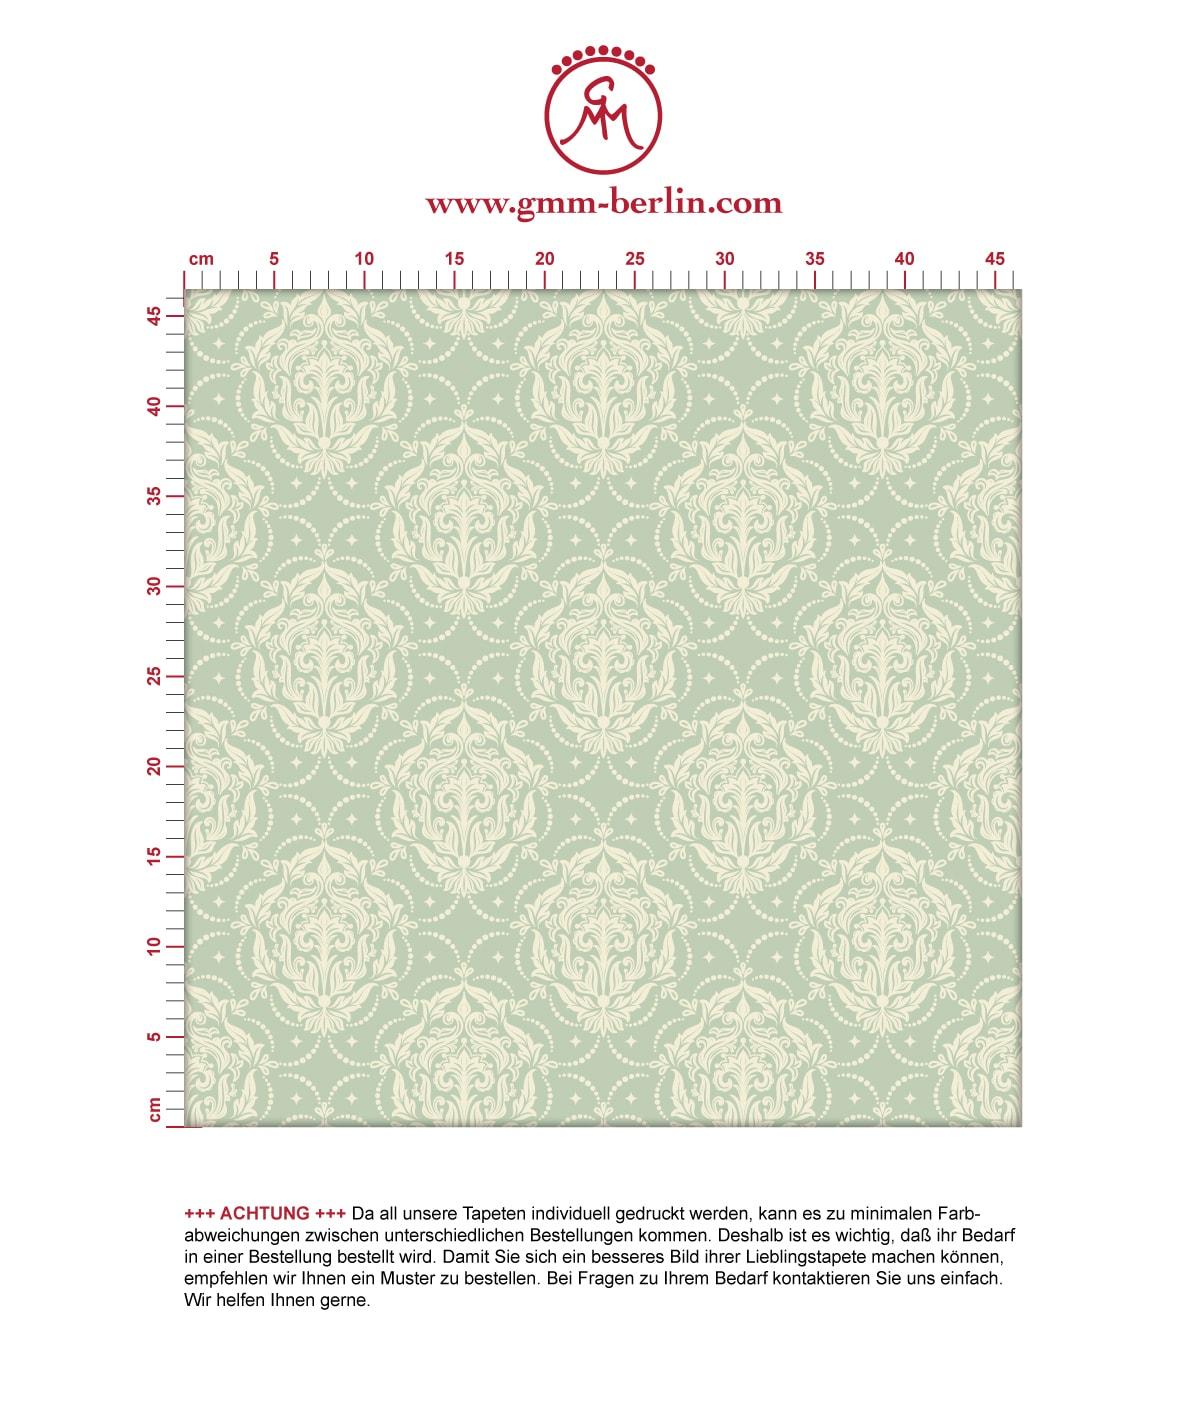 Mint Ornamenttapete My Castle Damast Muster, Design Tapete als Wandgestaltung 3